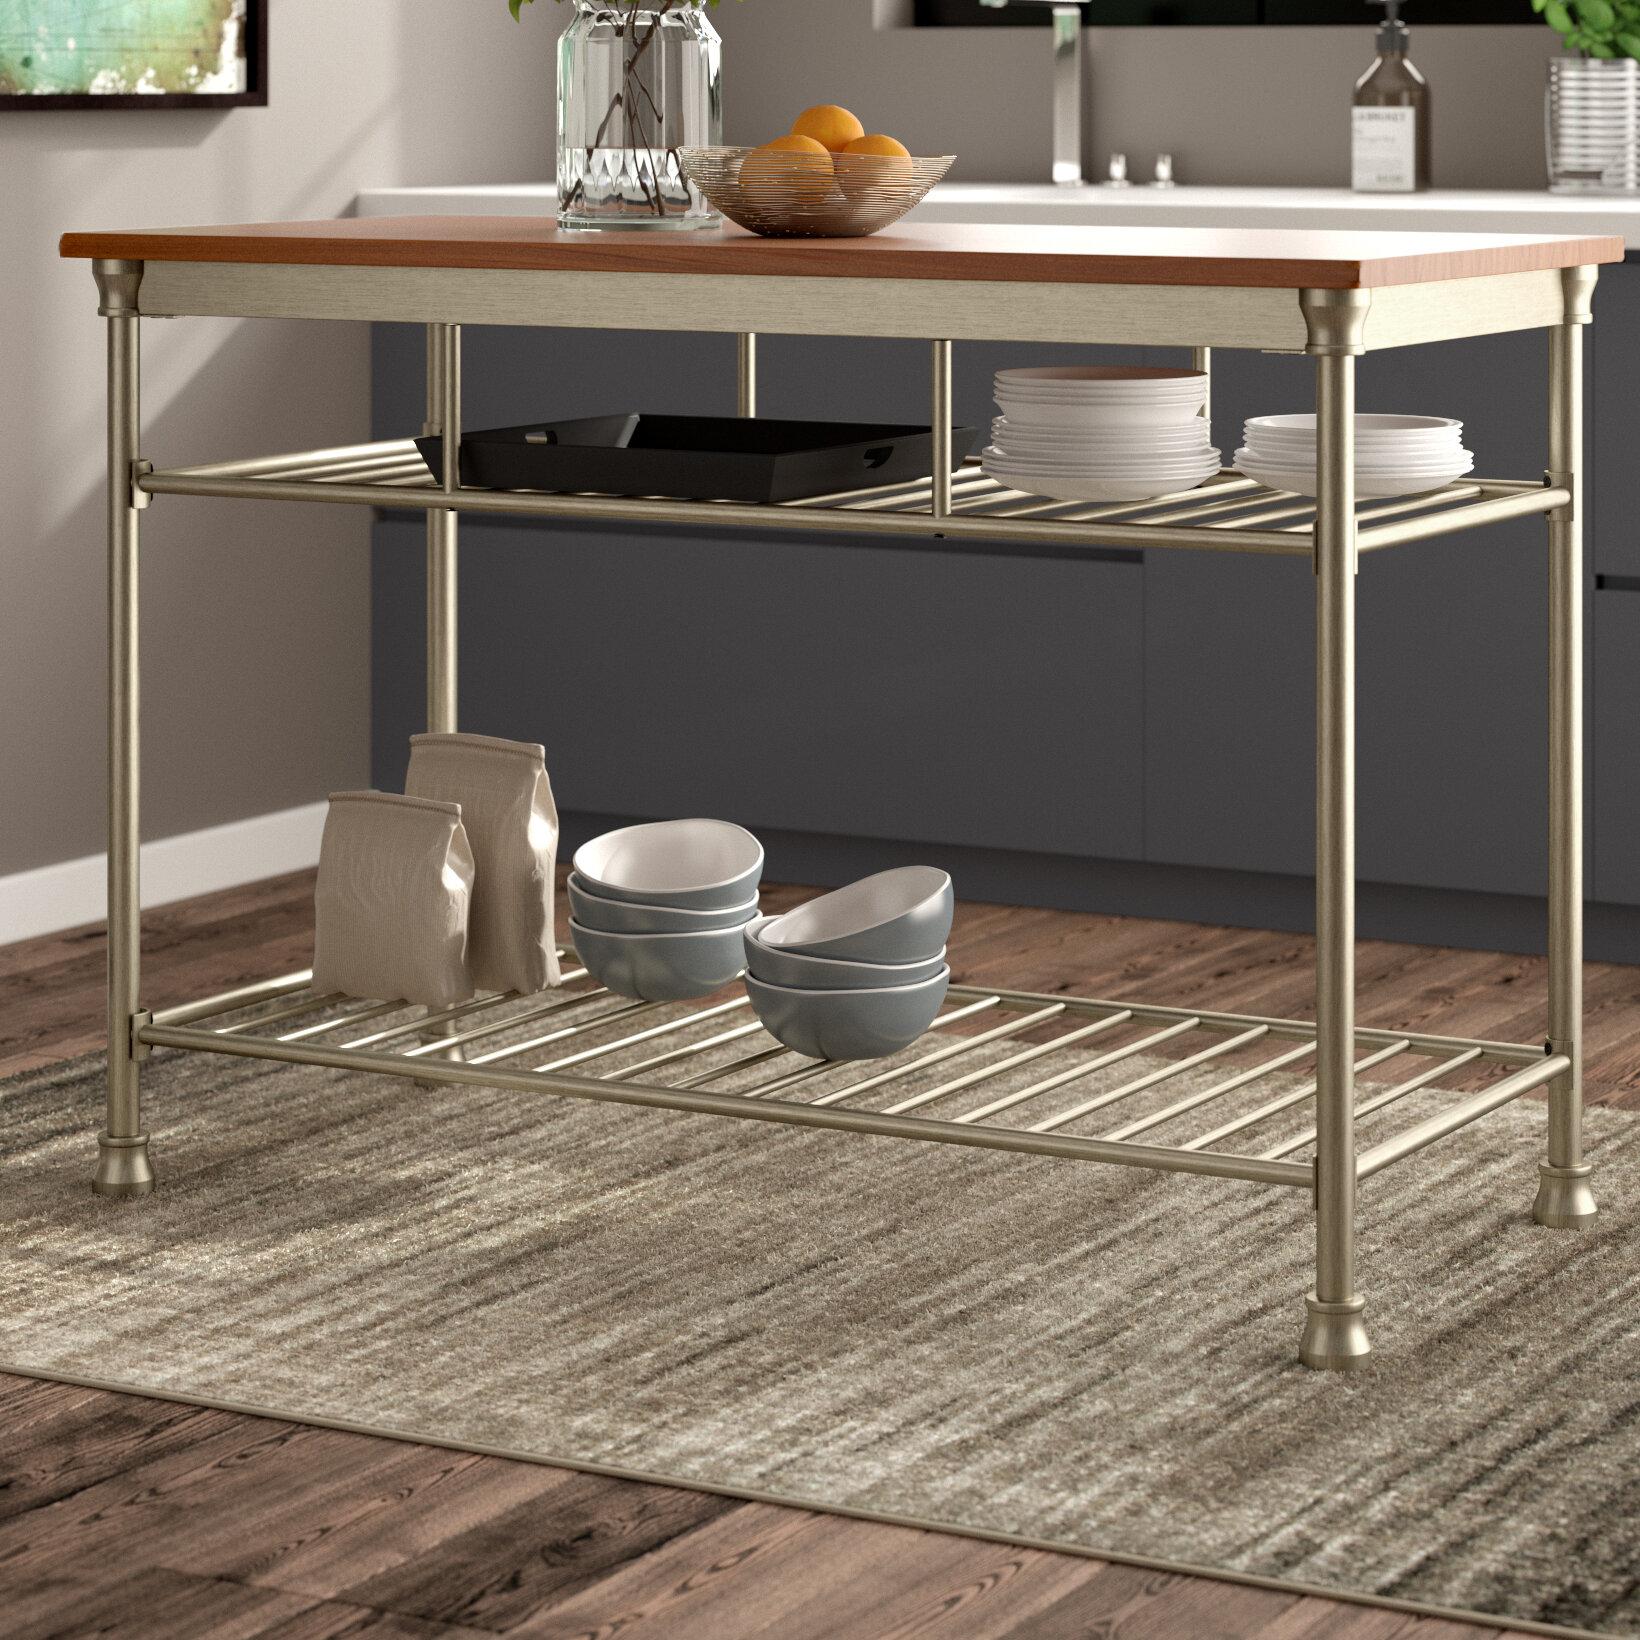 Trent austin design haleakal kitchen island with butcher block top reviews wayfair